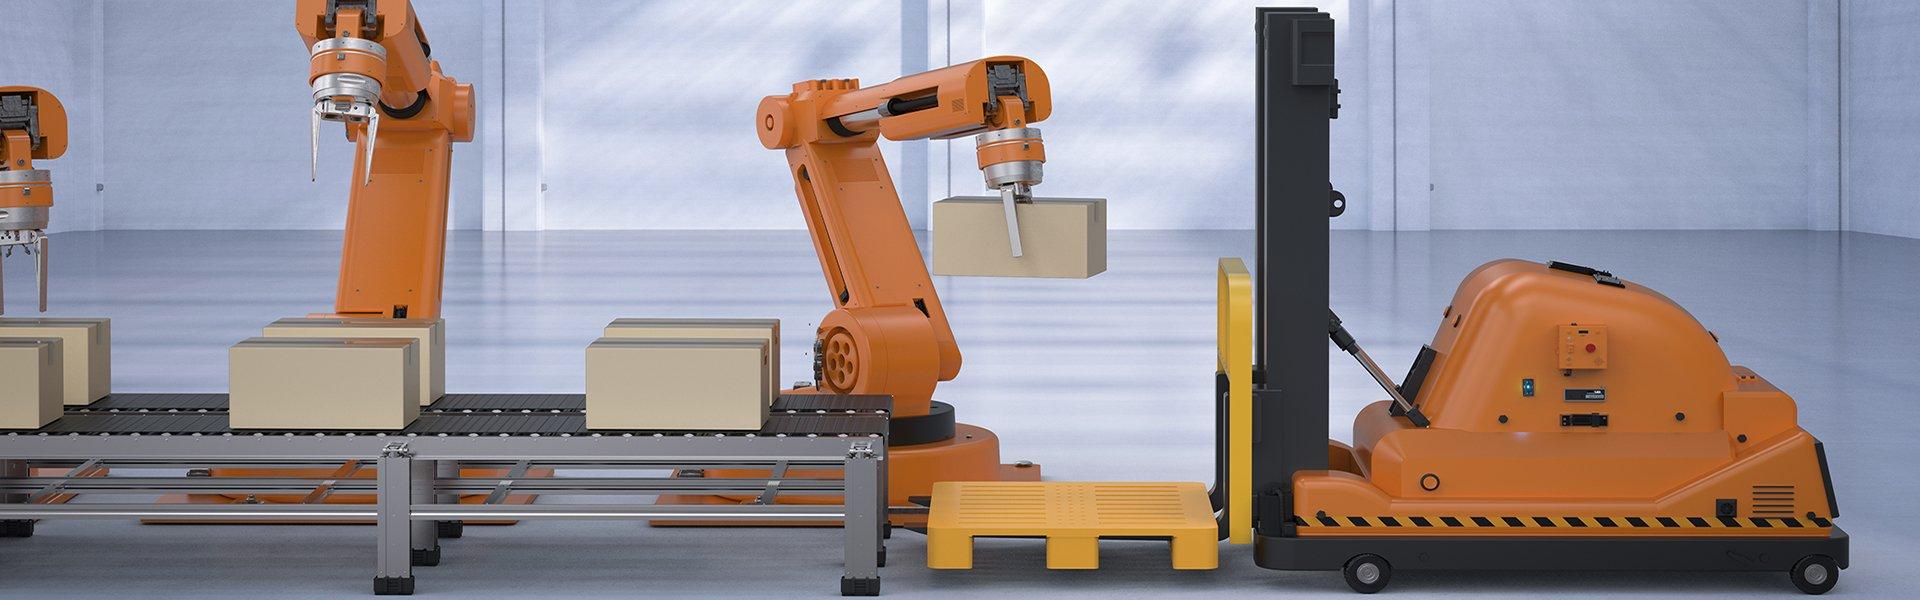 Industrial Drones and Robotics